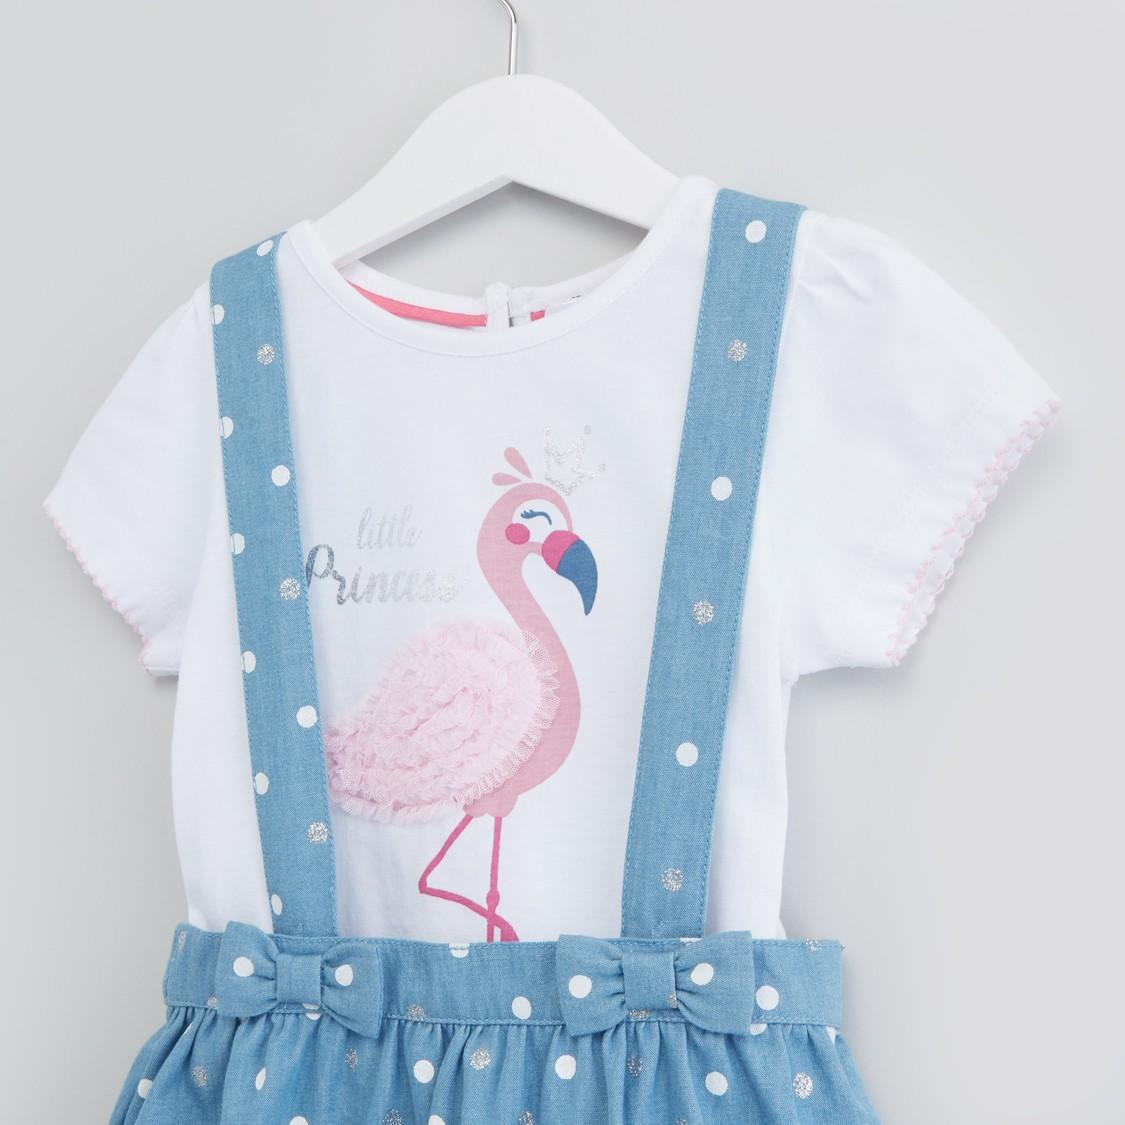 Flamingo Print T-shirt with Denim Suspender Skirt Set